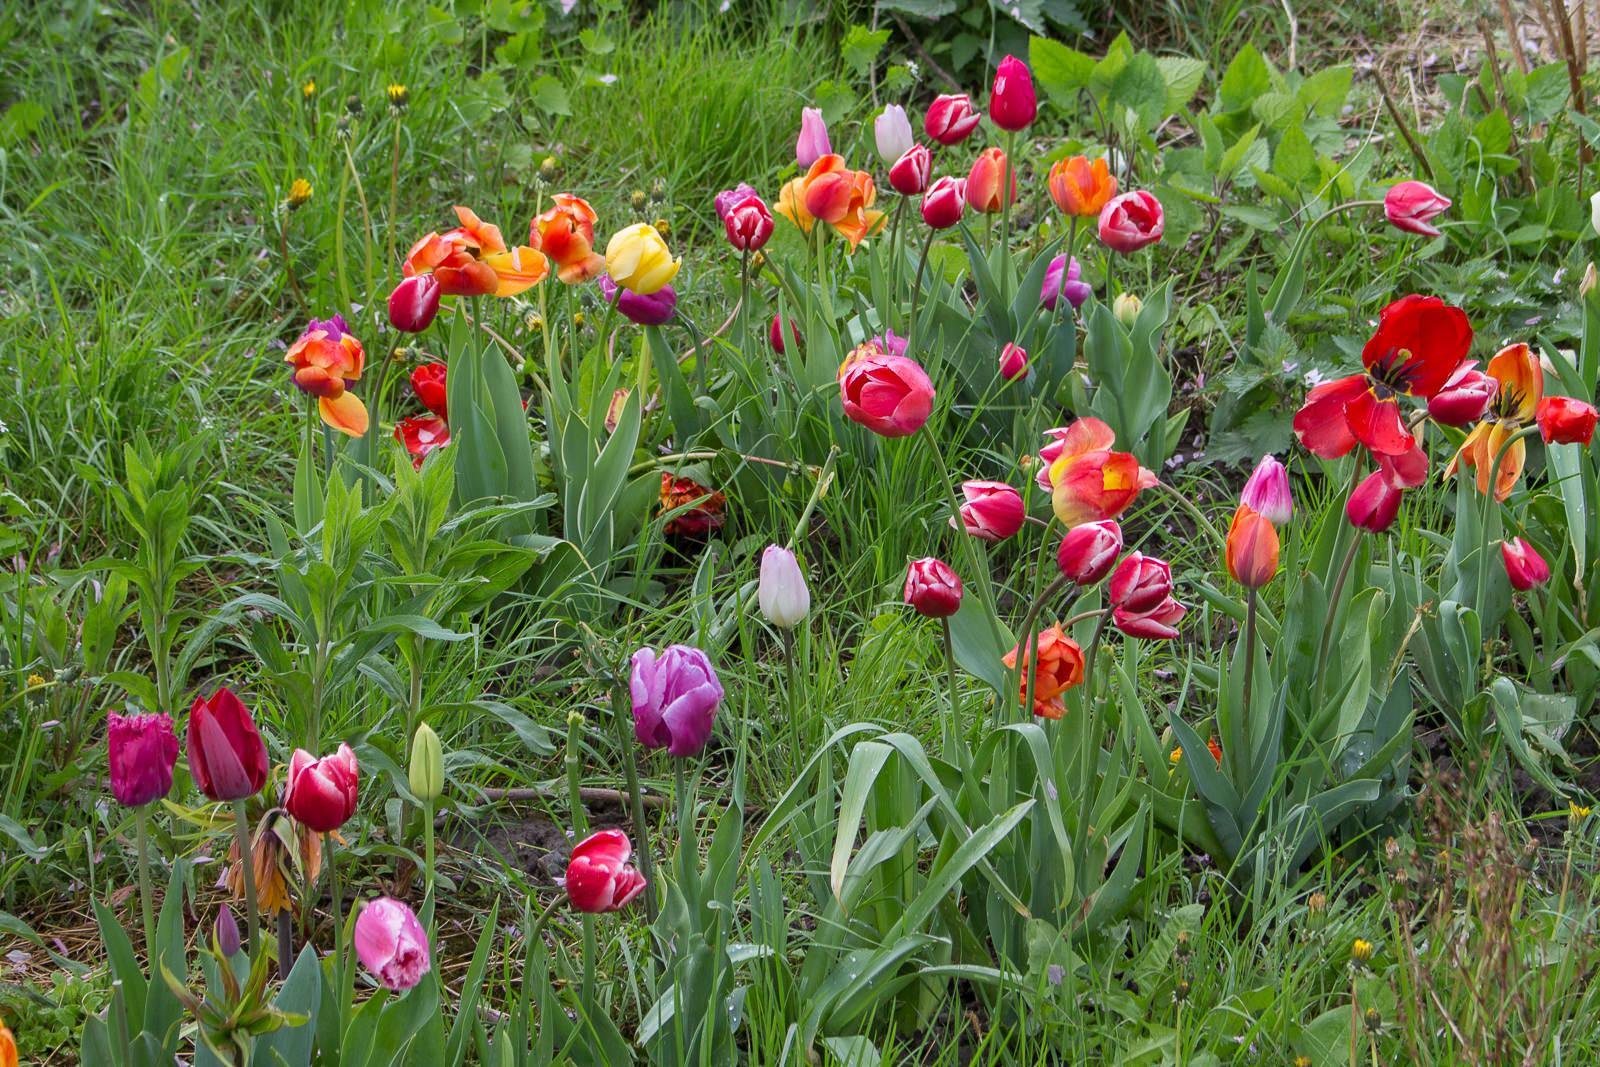 Hannekes Pluktuin, Pflückgarten, tulpen, flevoland, cabriotour, roadtrip, tulpenroute